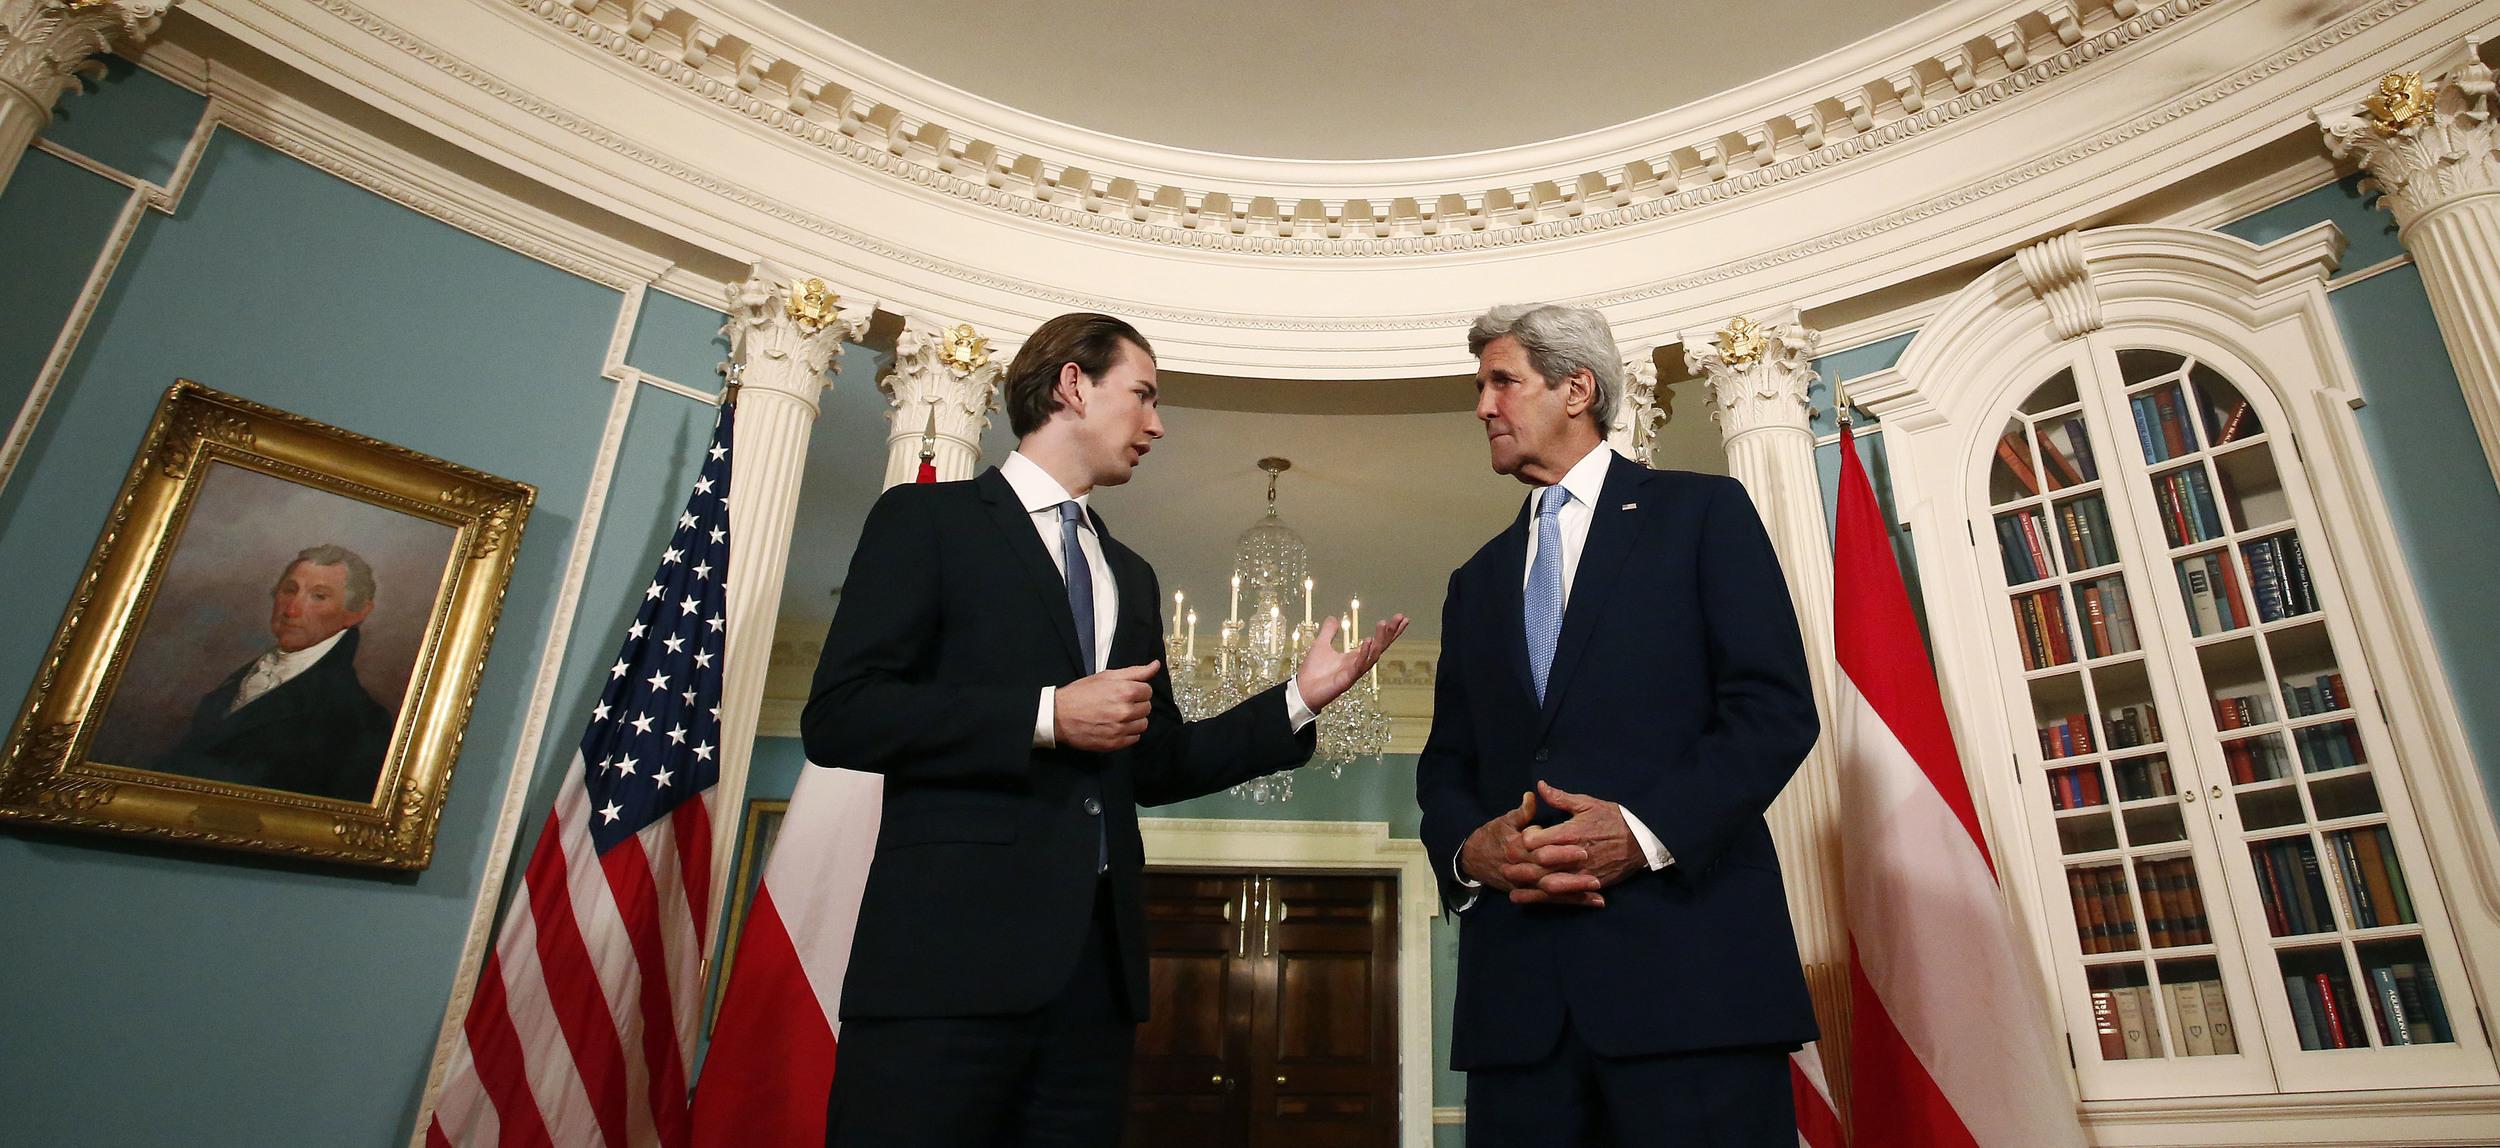 FM Kurz and Secretary Kerry before their meeting. Photo: Dragan Tatic